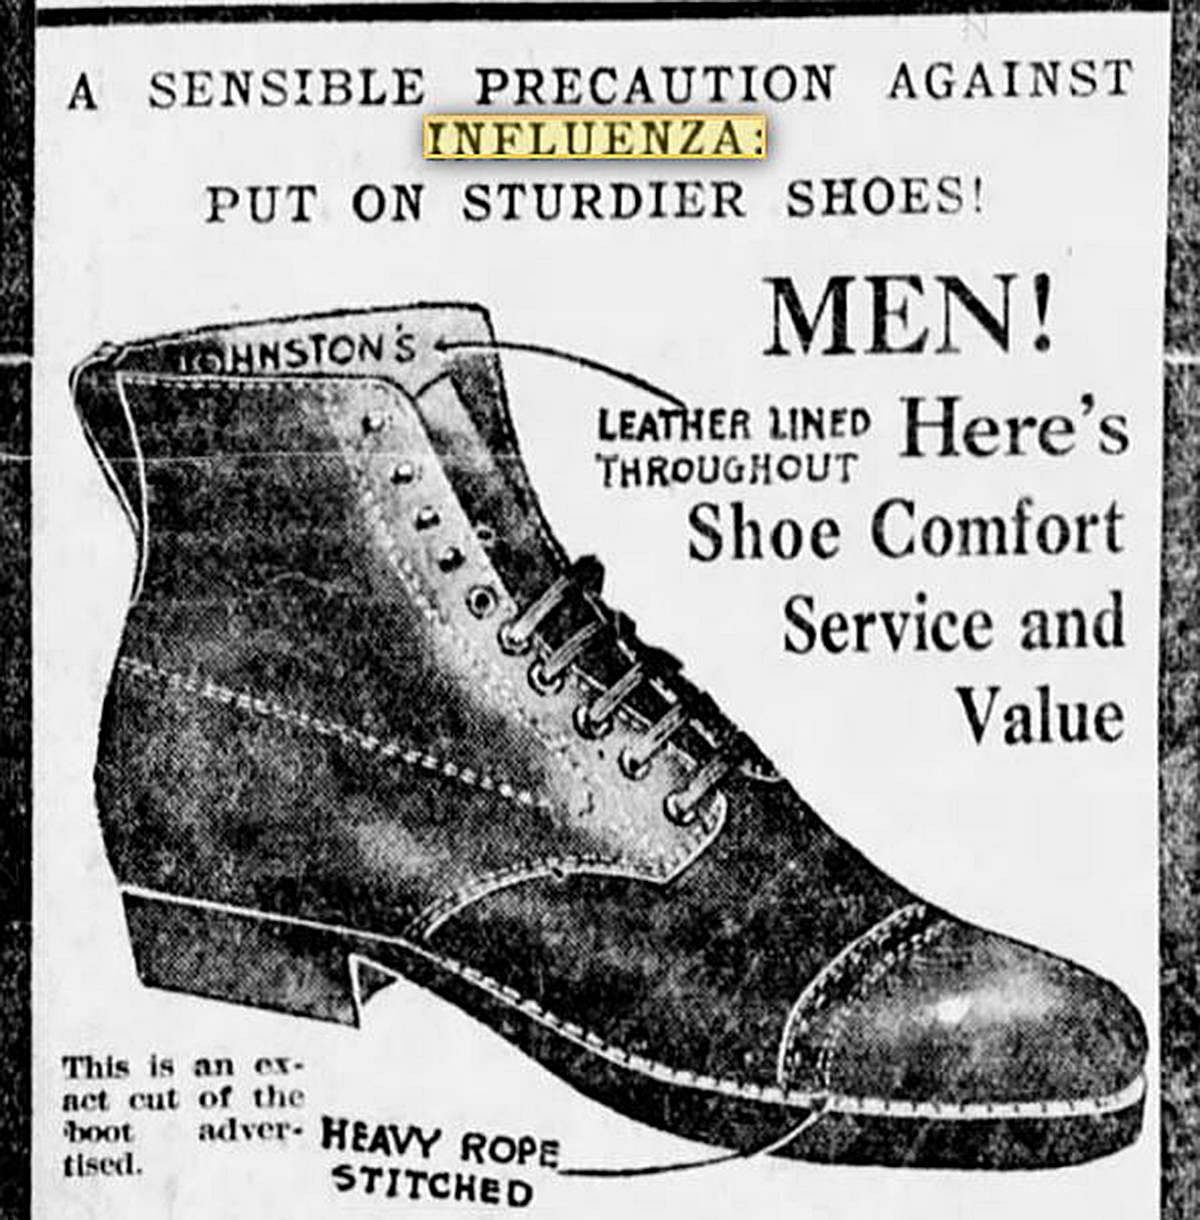 Johnston's Shoes